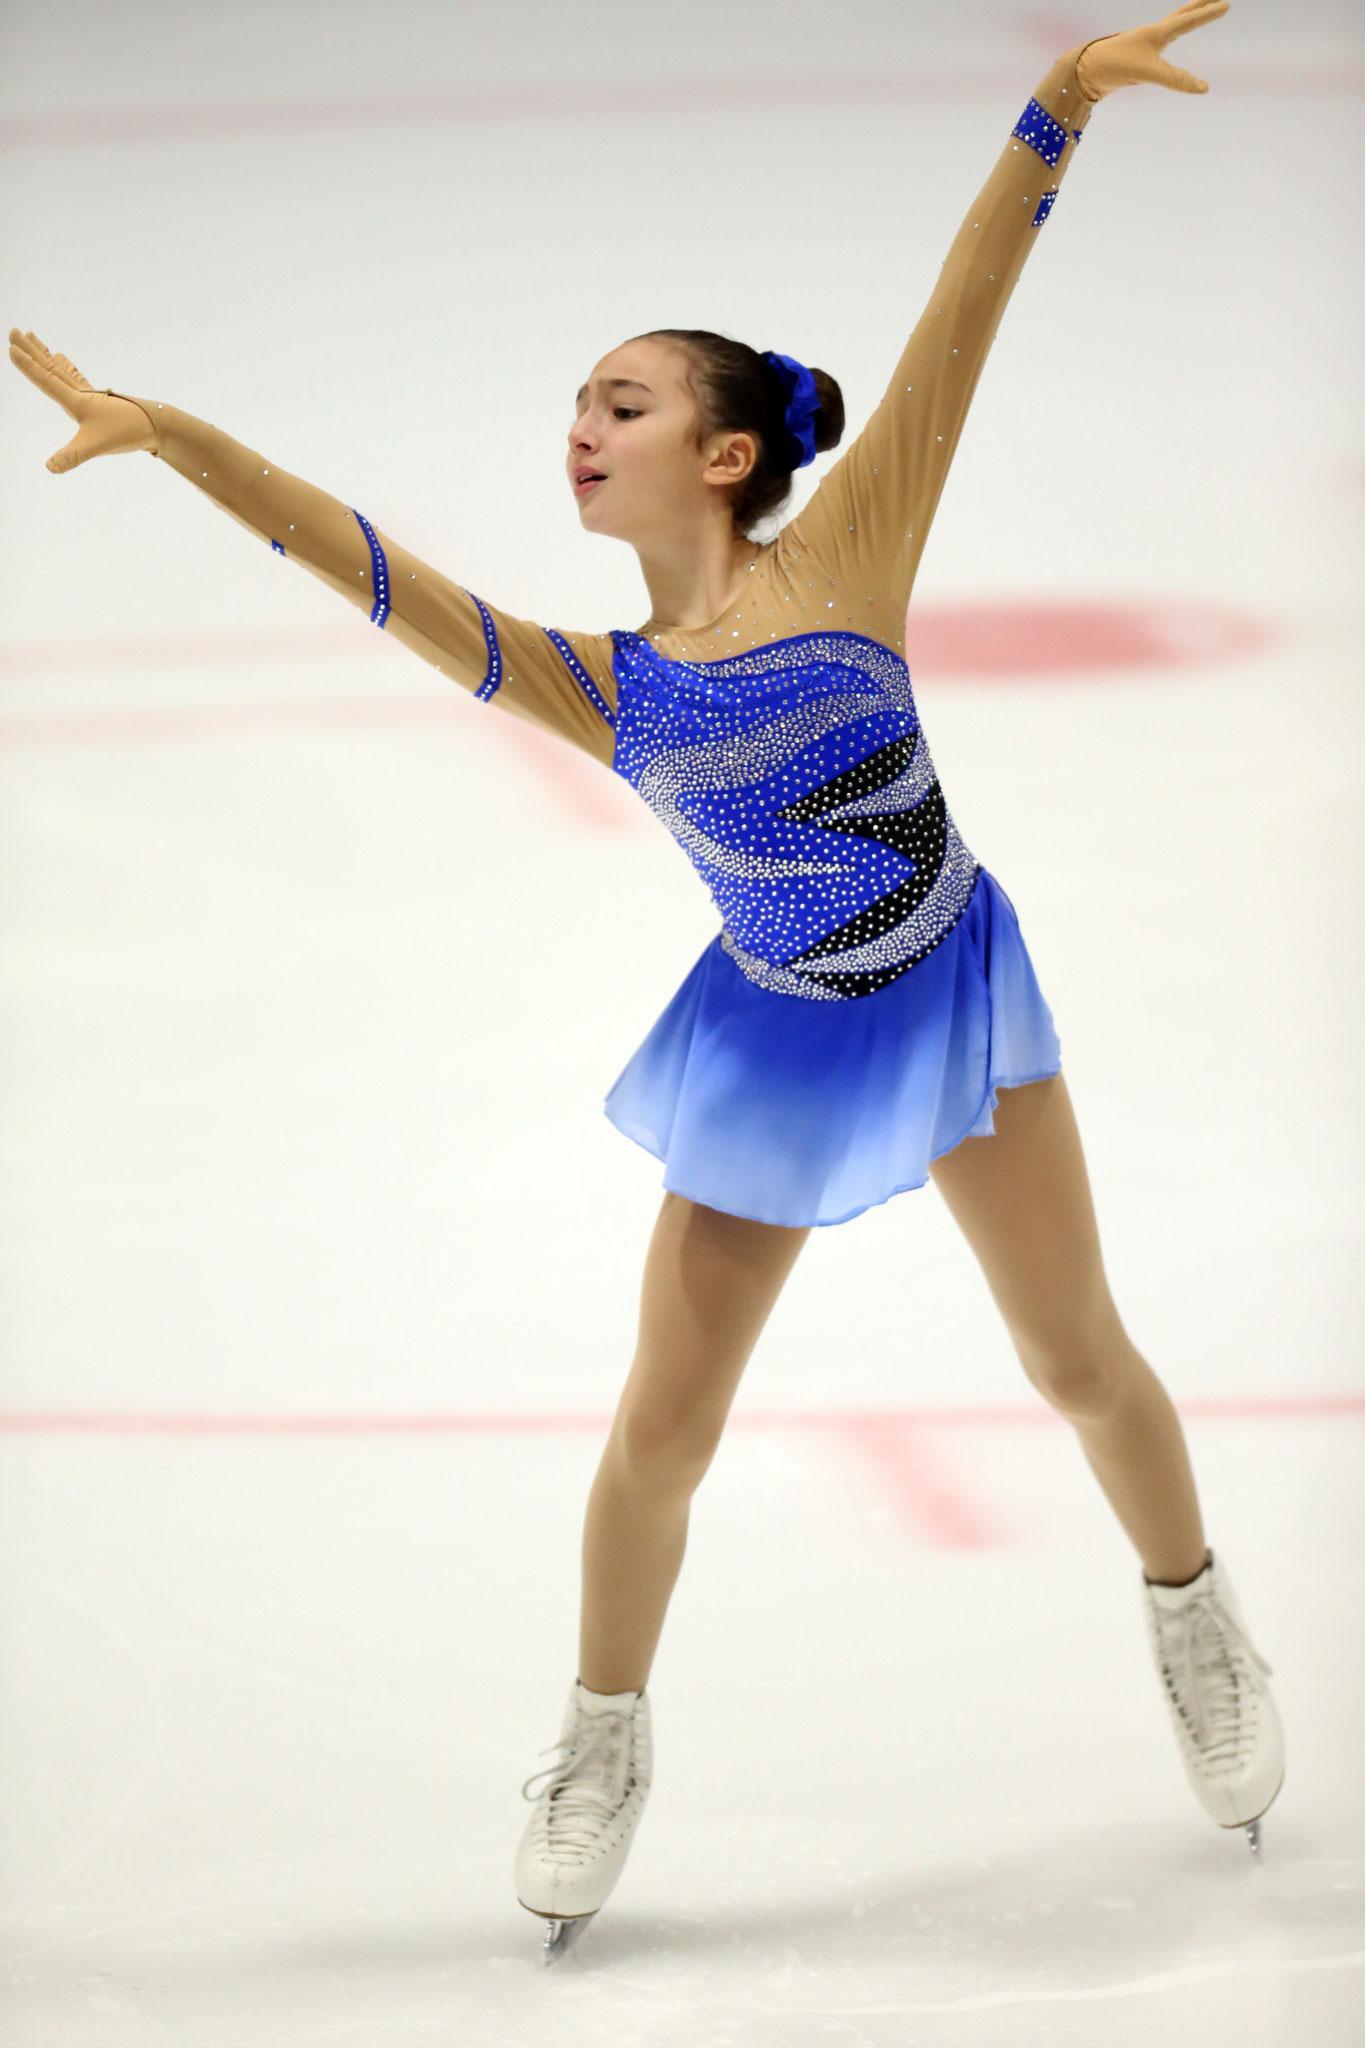 Emma Binder